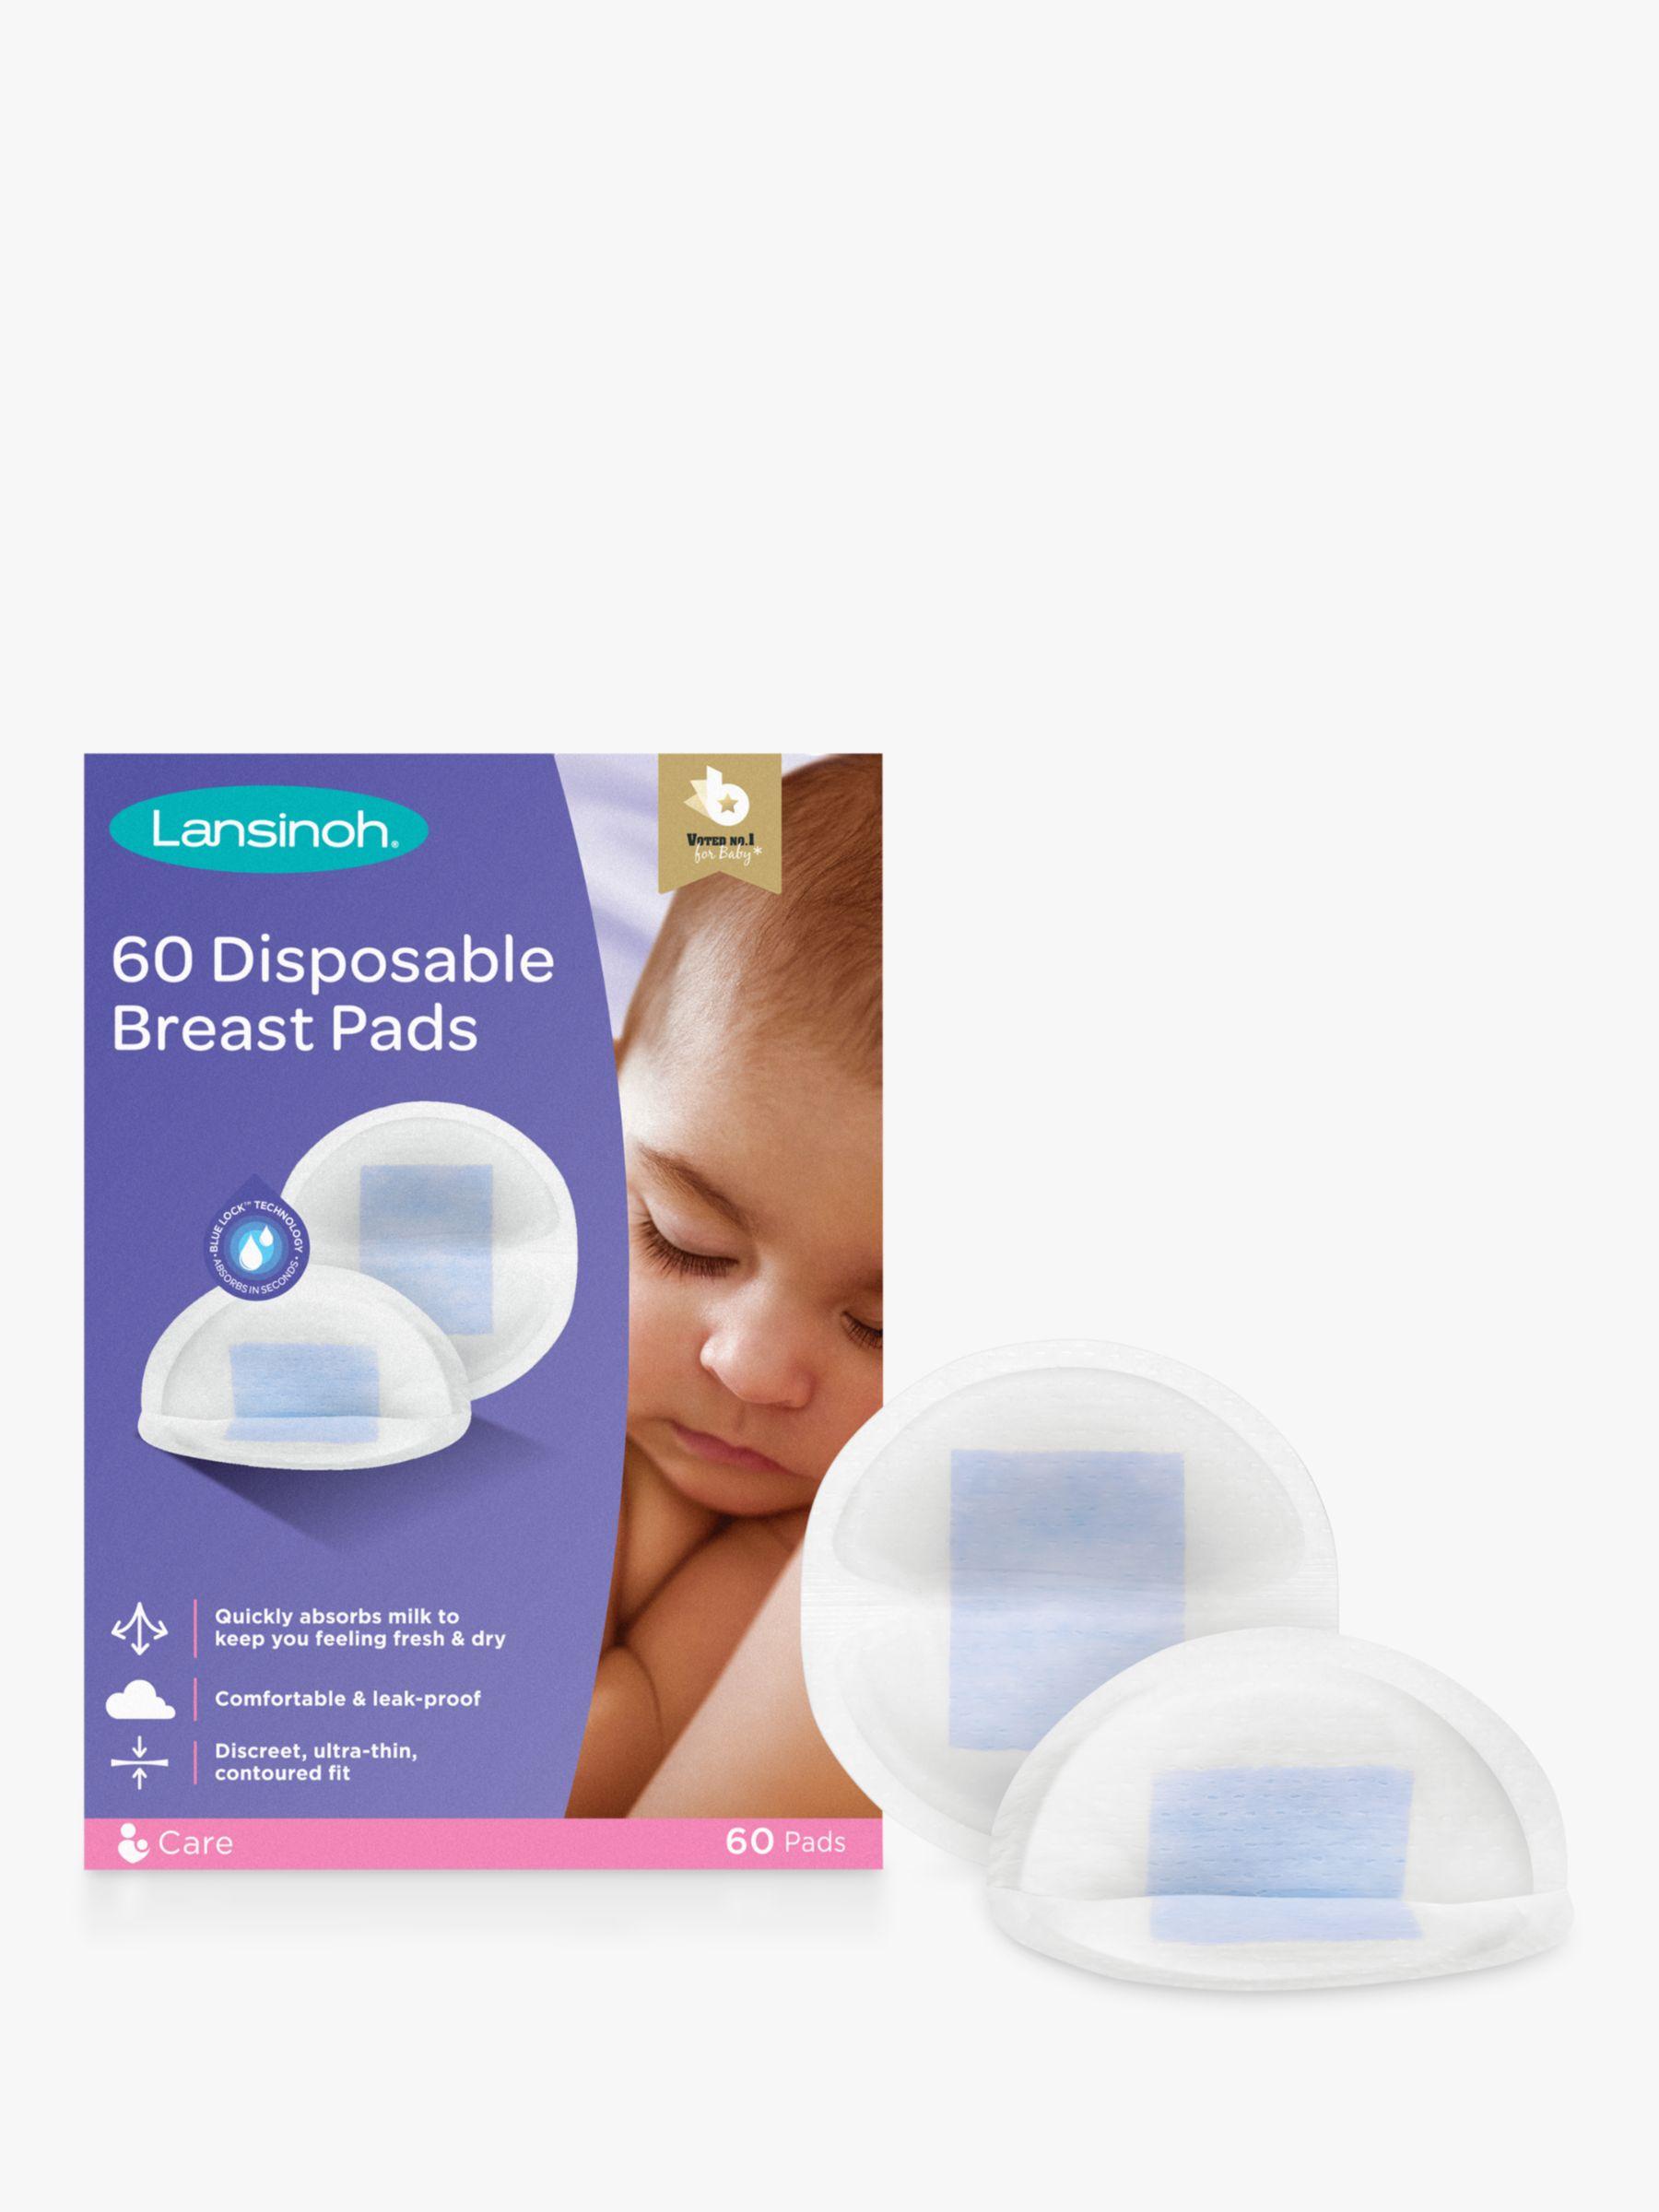 Lansinoh Lansinoh Disposable Breast Pads, Pack of 60